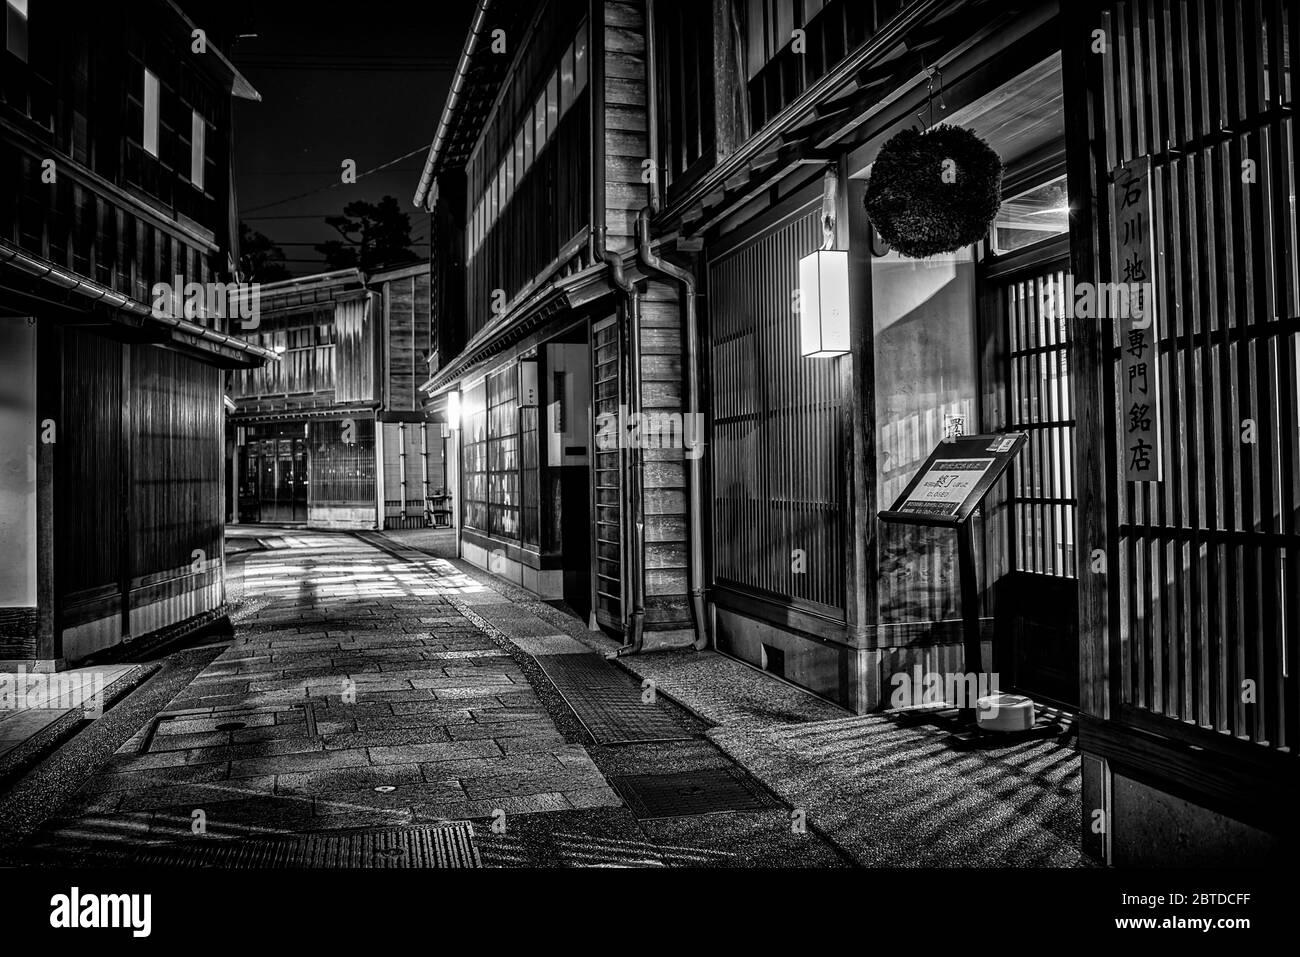 Quartier Higashi Chaya, Kanazawa, Japon. Banque D'Images